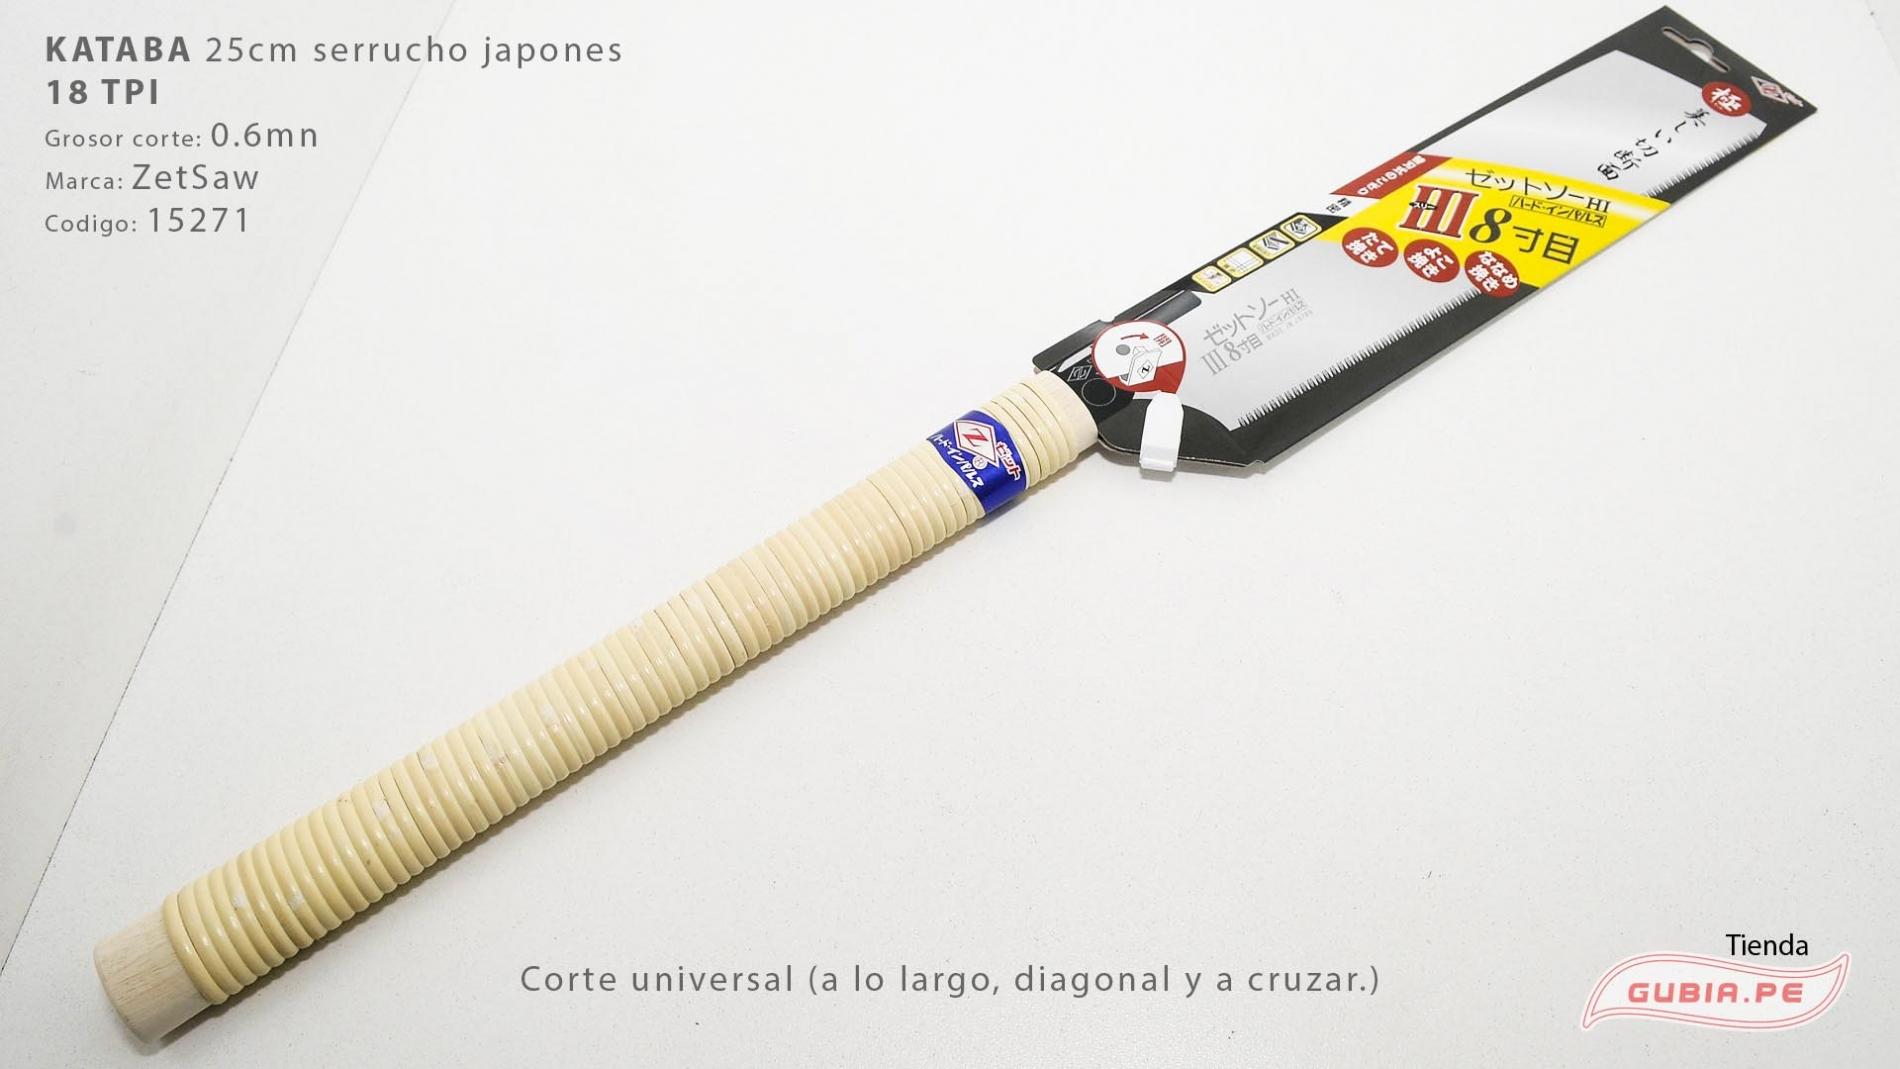 15271-Kataba 18TPI corte universal 25cm ZetSaw 15271-max-2.